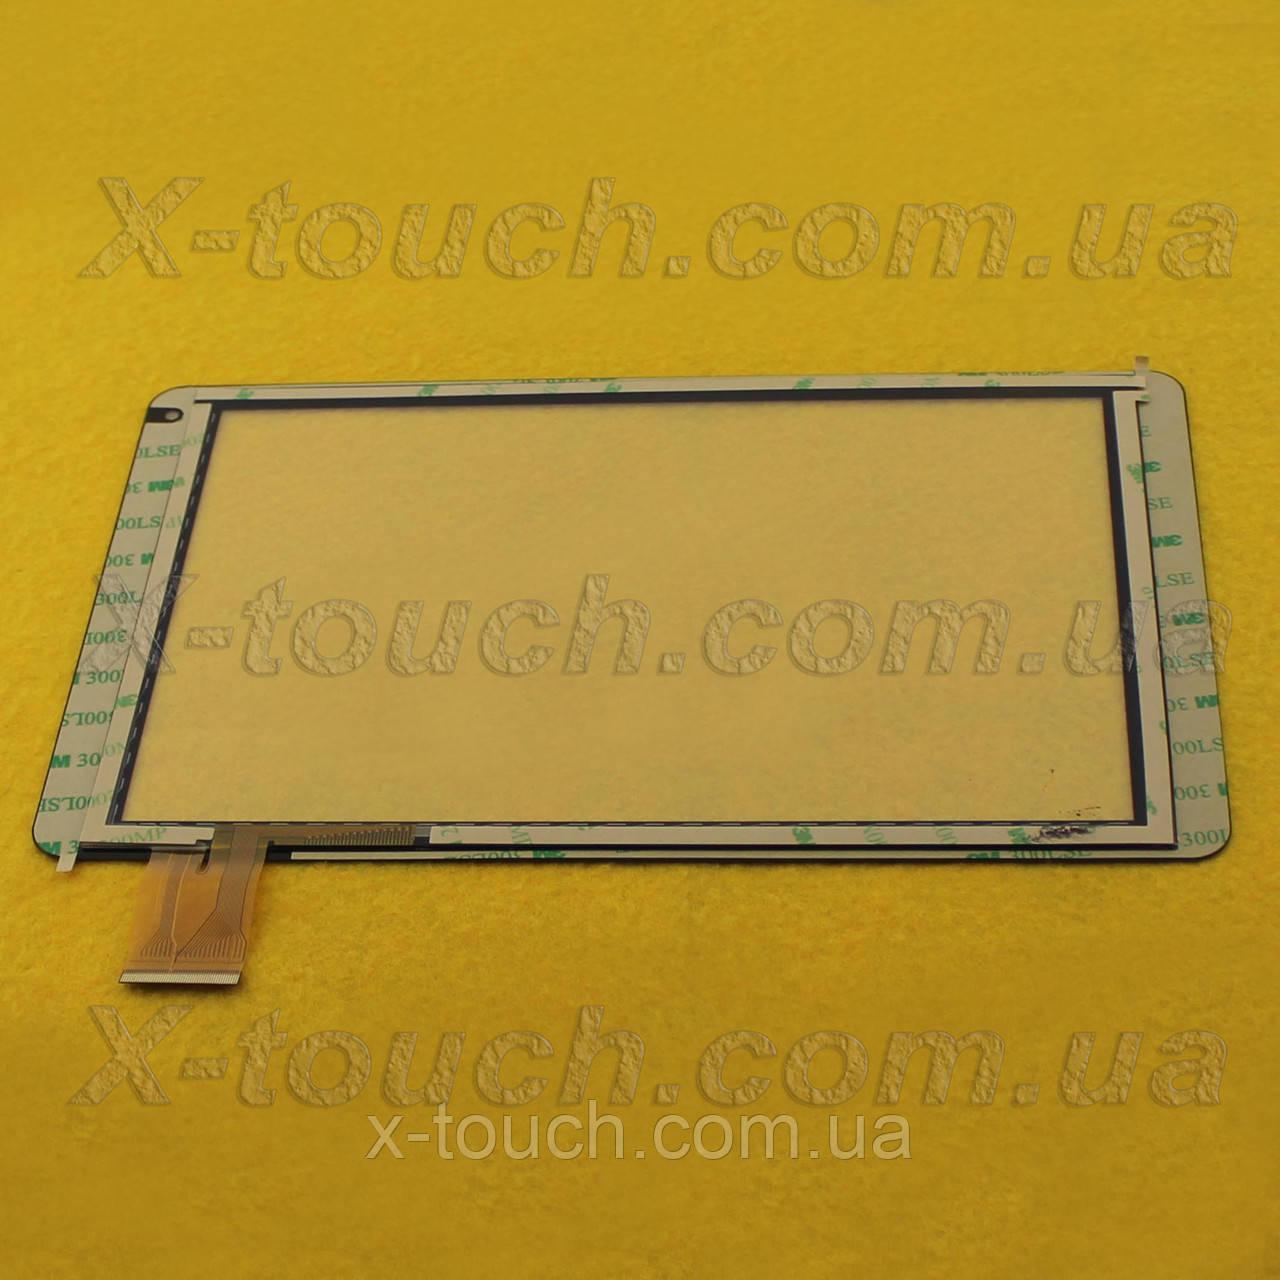 Тачскрин, сенсор Sigma mobile X-style Tab A104 для планшета, цвет черный - фото 2